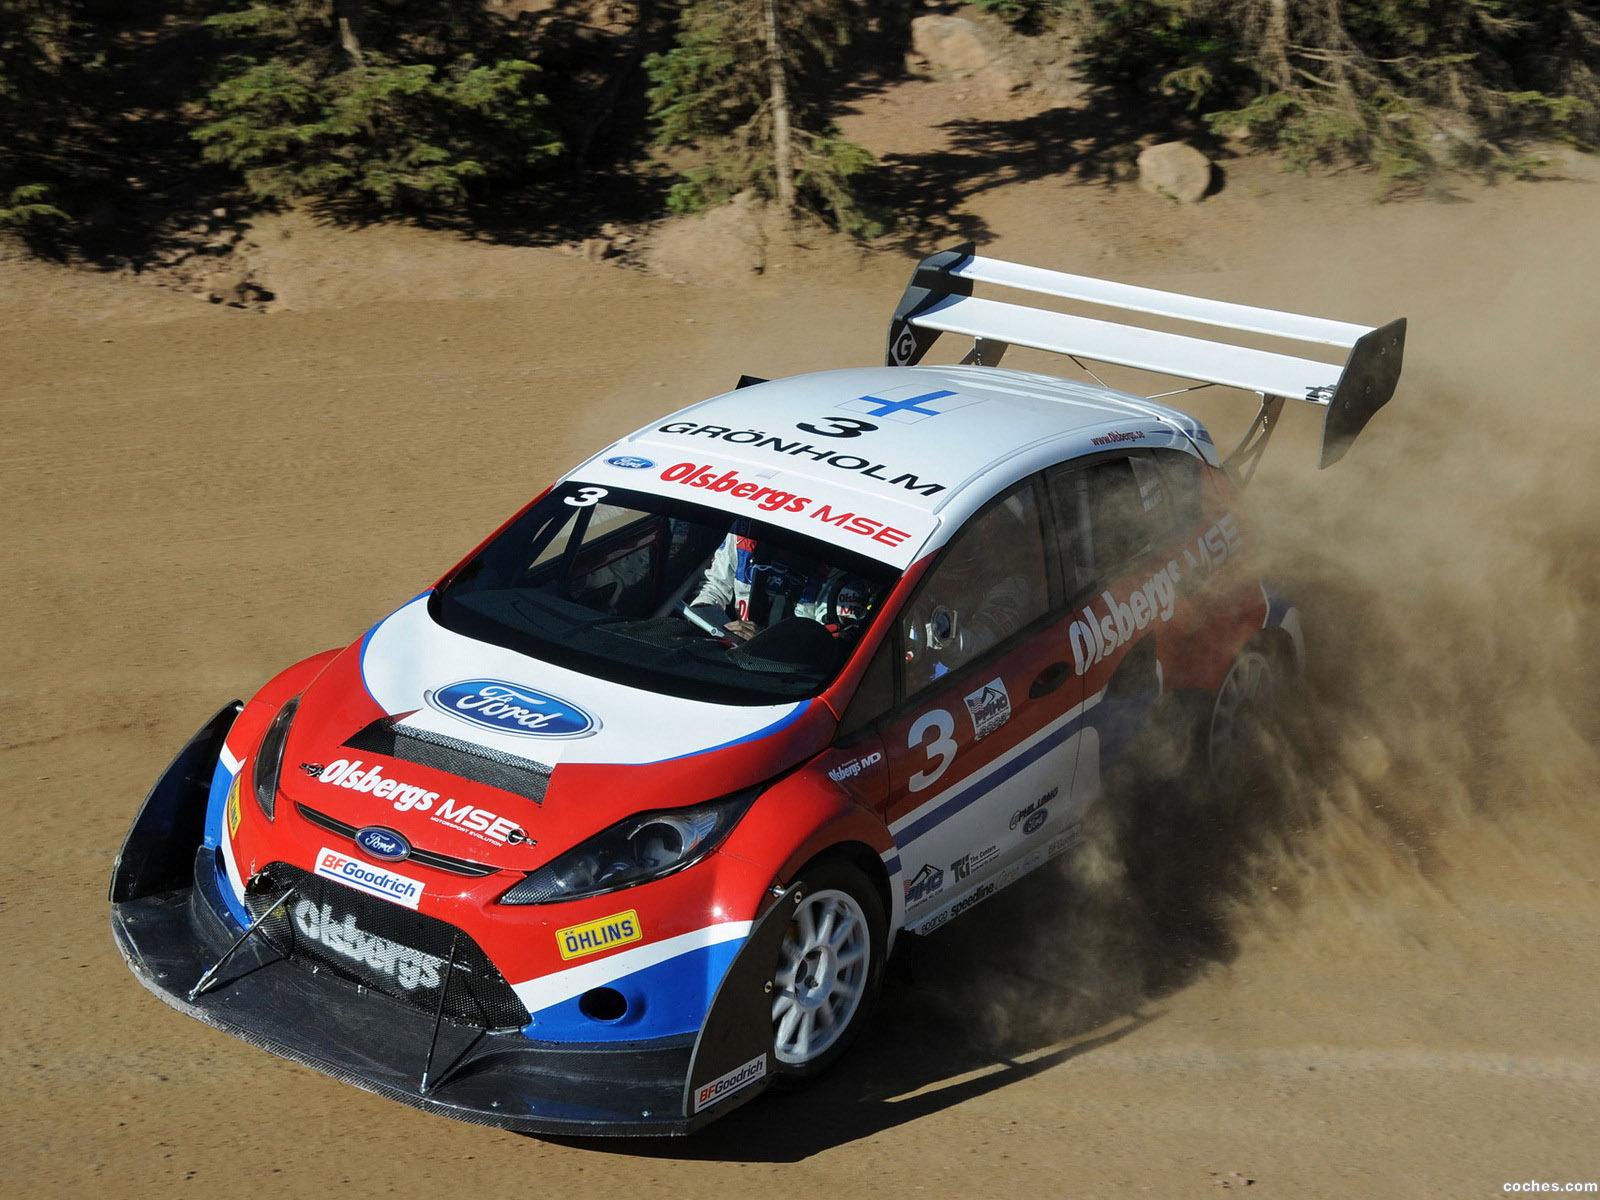 Campeonatos de Montaña Nacionales e Internacionales (FIA European Hillclimb, Berg Cup, BHC, CIVM, CFM...) - Página 3 Ford_fiesta-rallycross-pikes-peak-2009_r6